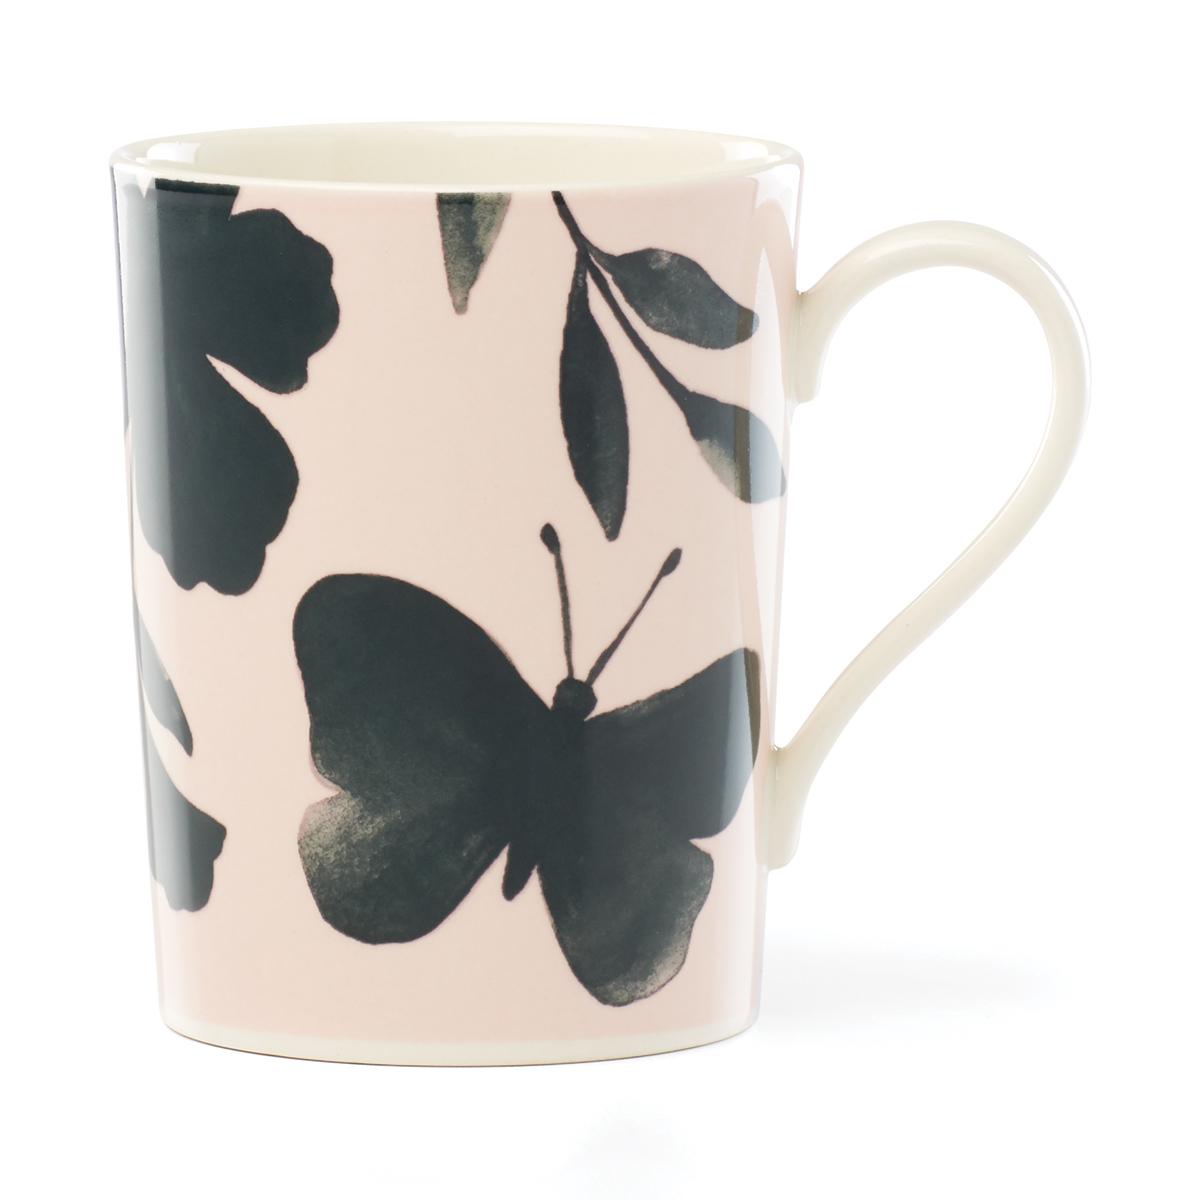 Kate Spade China by Lenox, Petal Ln Floral Mug Green Flower